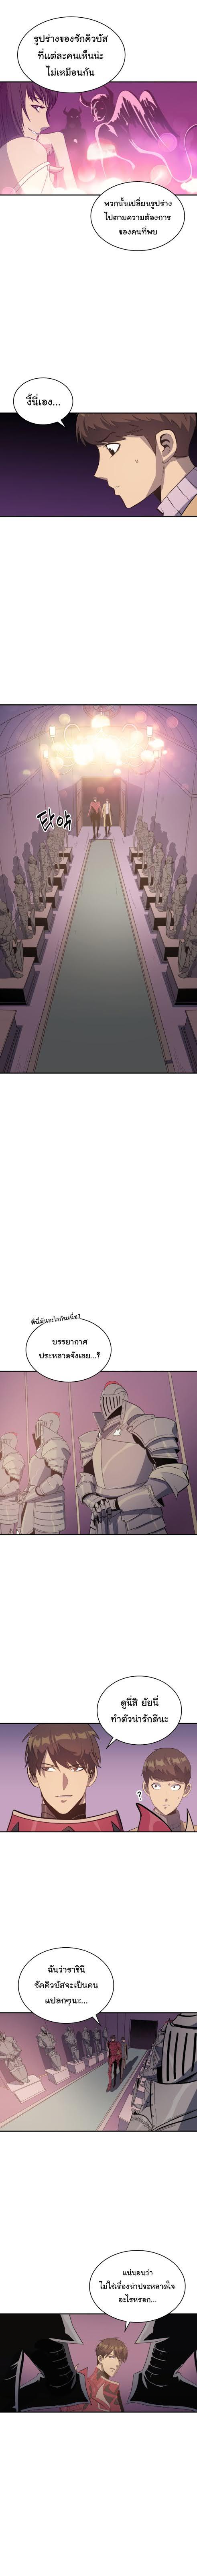 Max Level Returner - หน้า 12